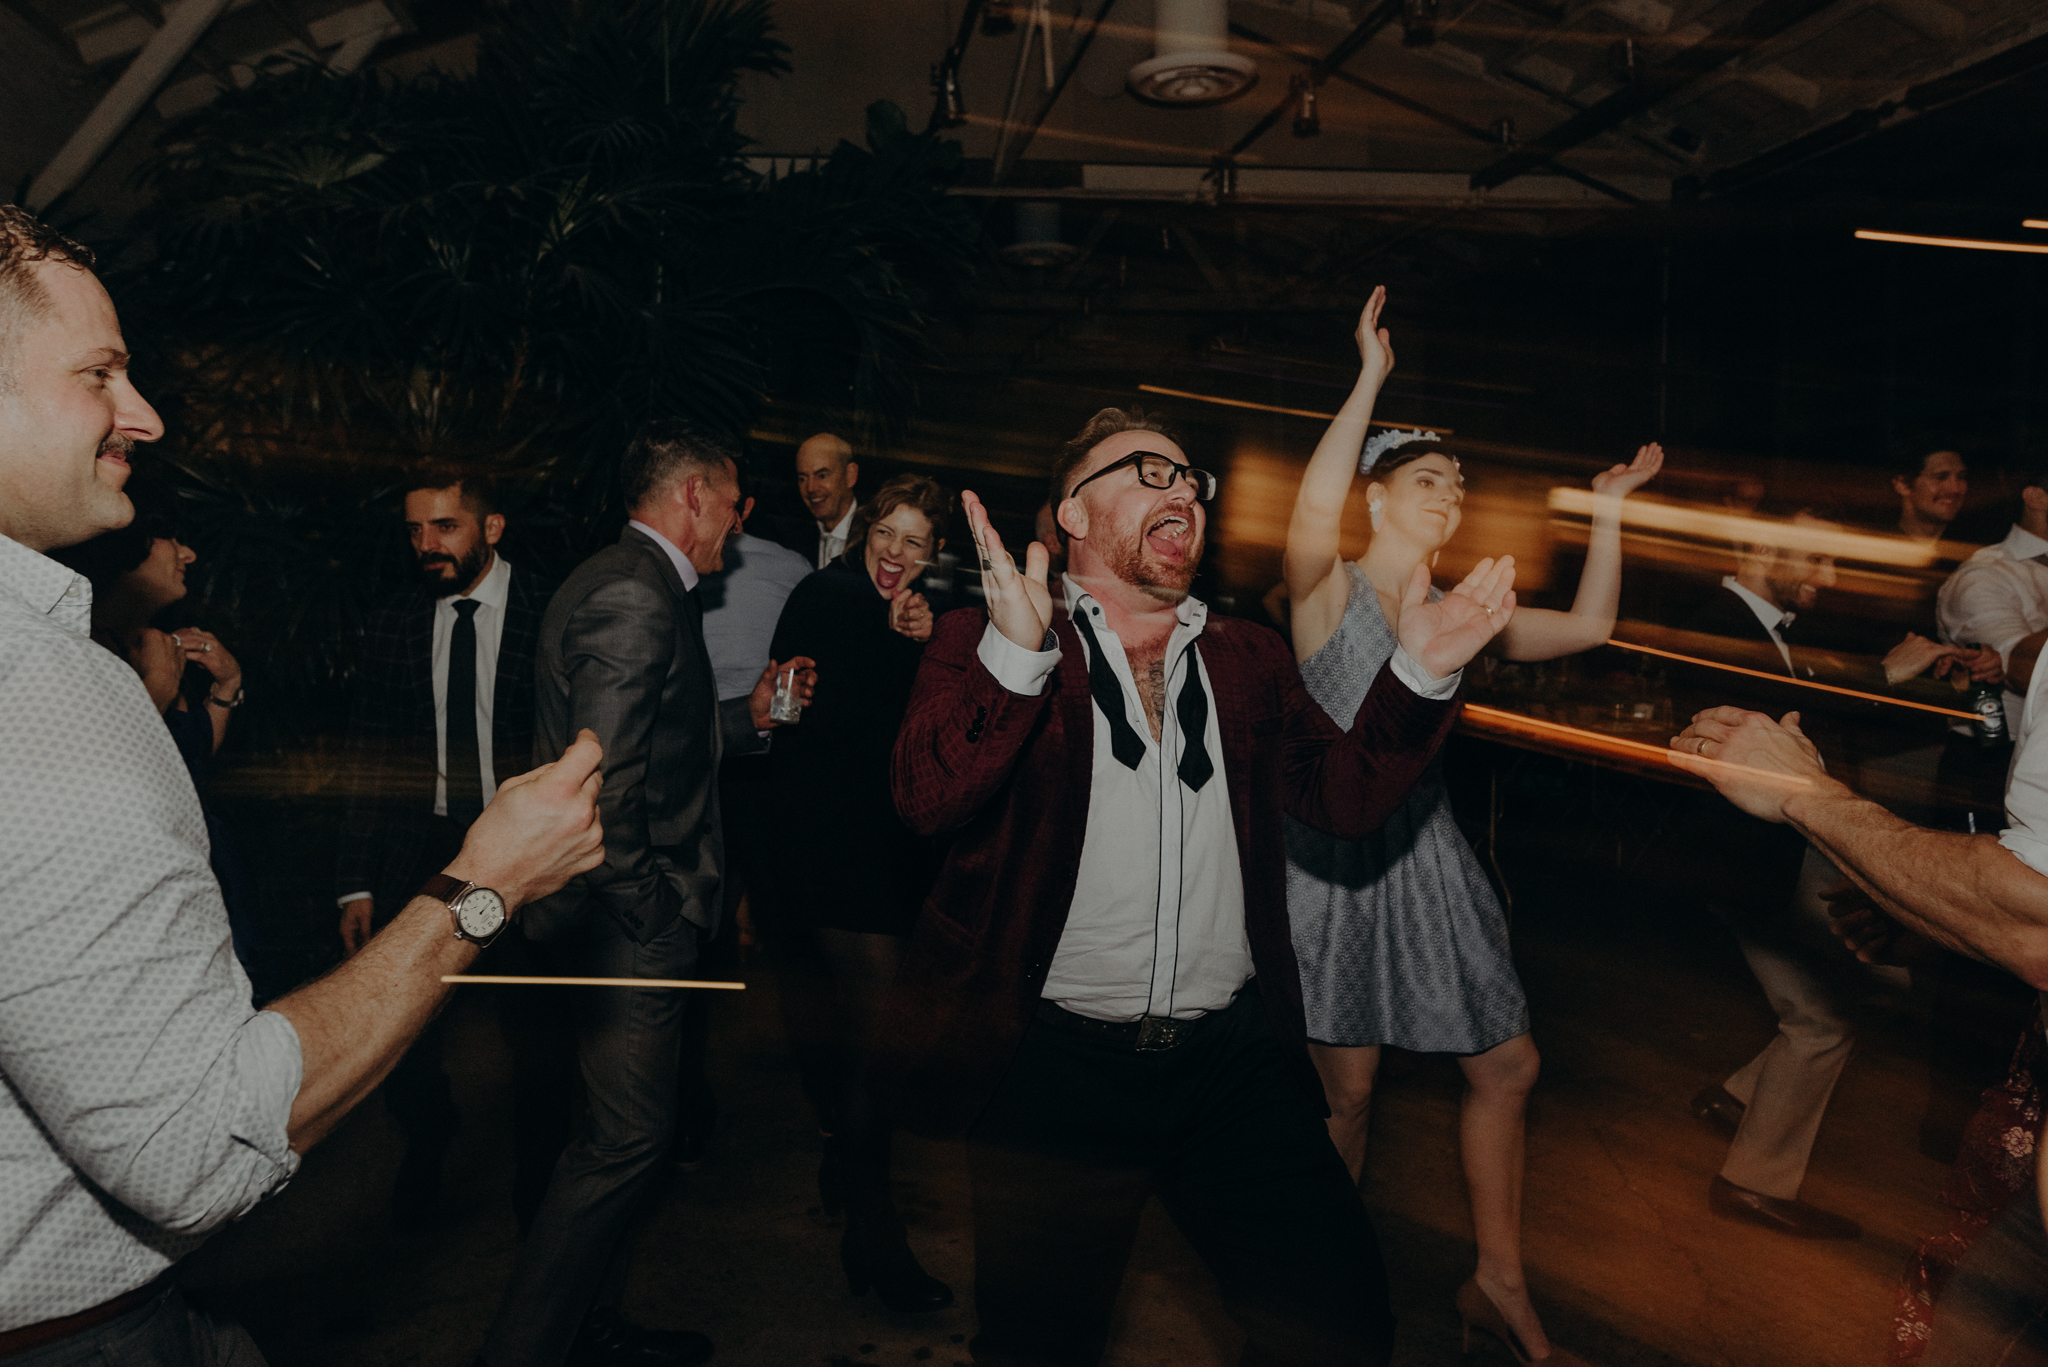 Wedding Photo LA - wedding photographer in los angeles - millwick wedding venue -isaiahandtaylor.com-144.jpg